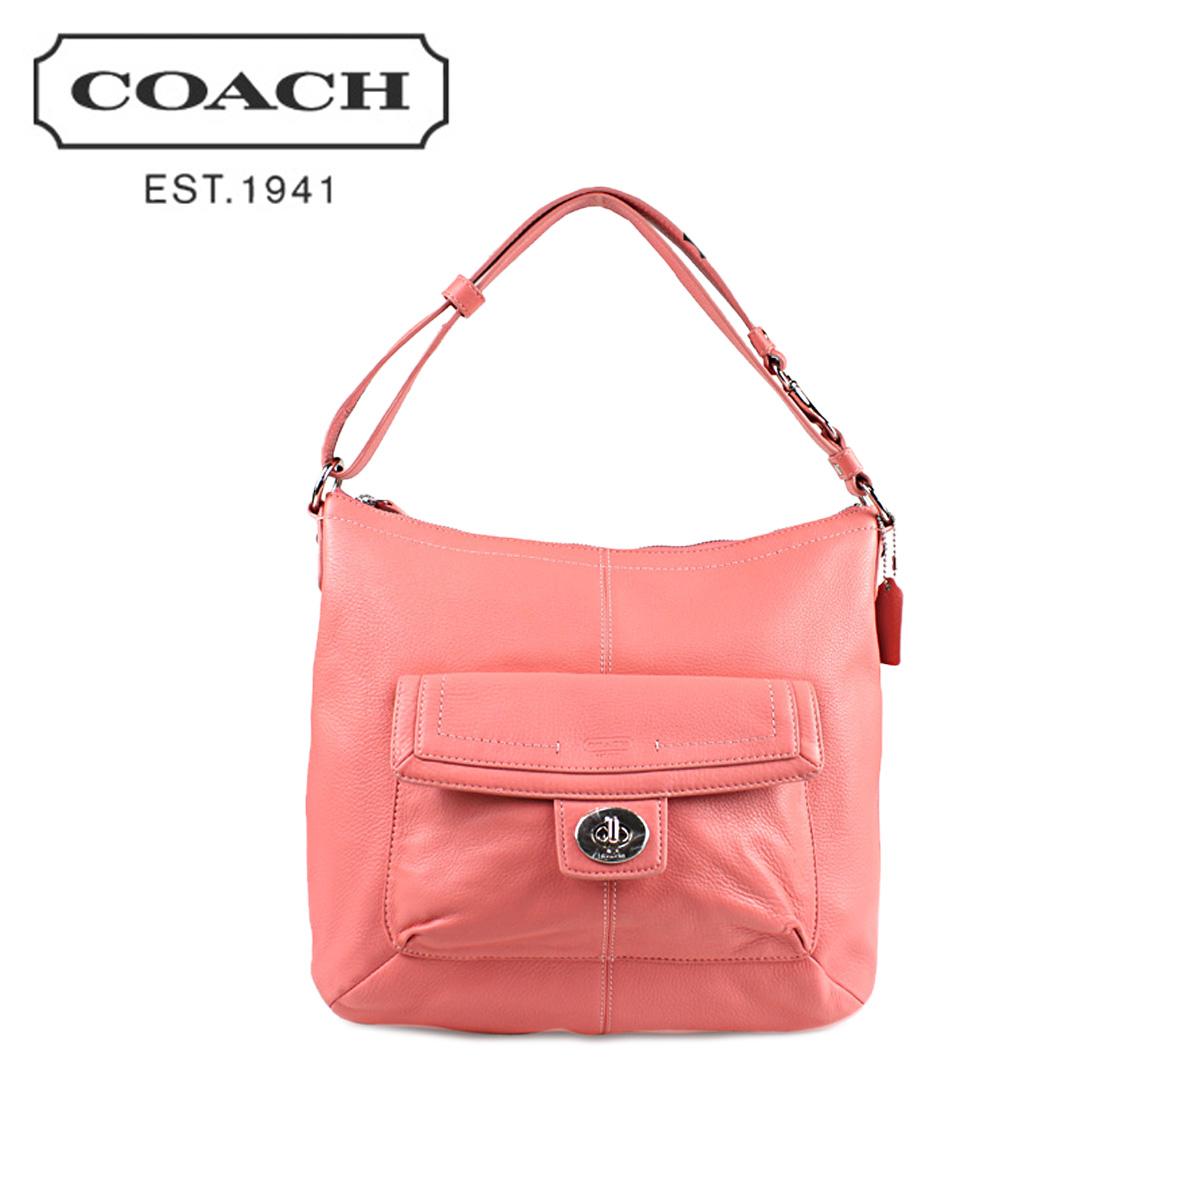 6a22f1b6f8 Sugar Online Shop  Coach COACH shoulder bags coral Penelope leather ...